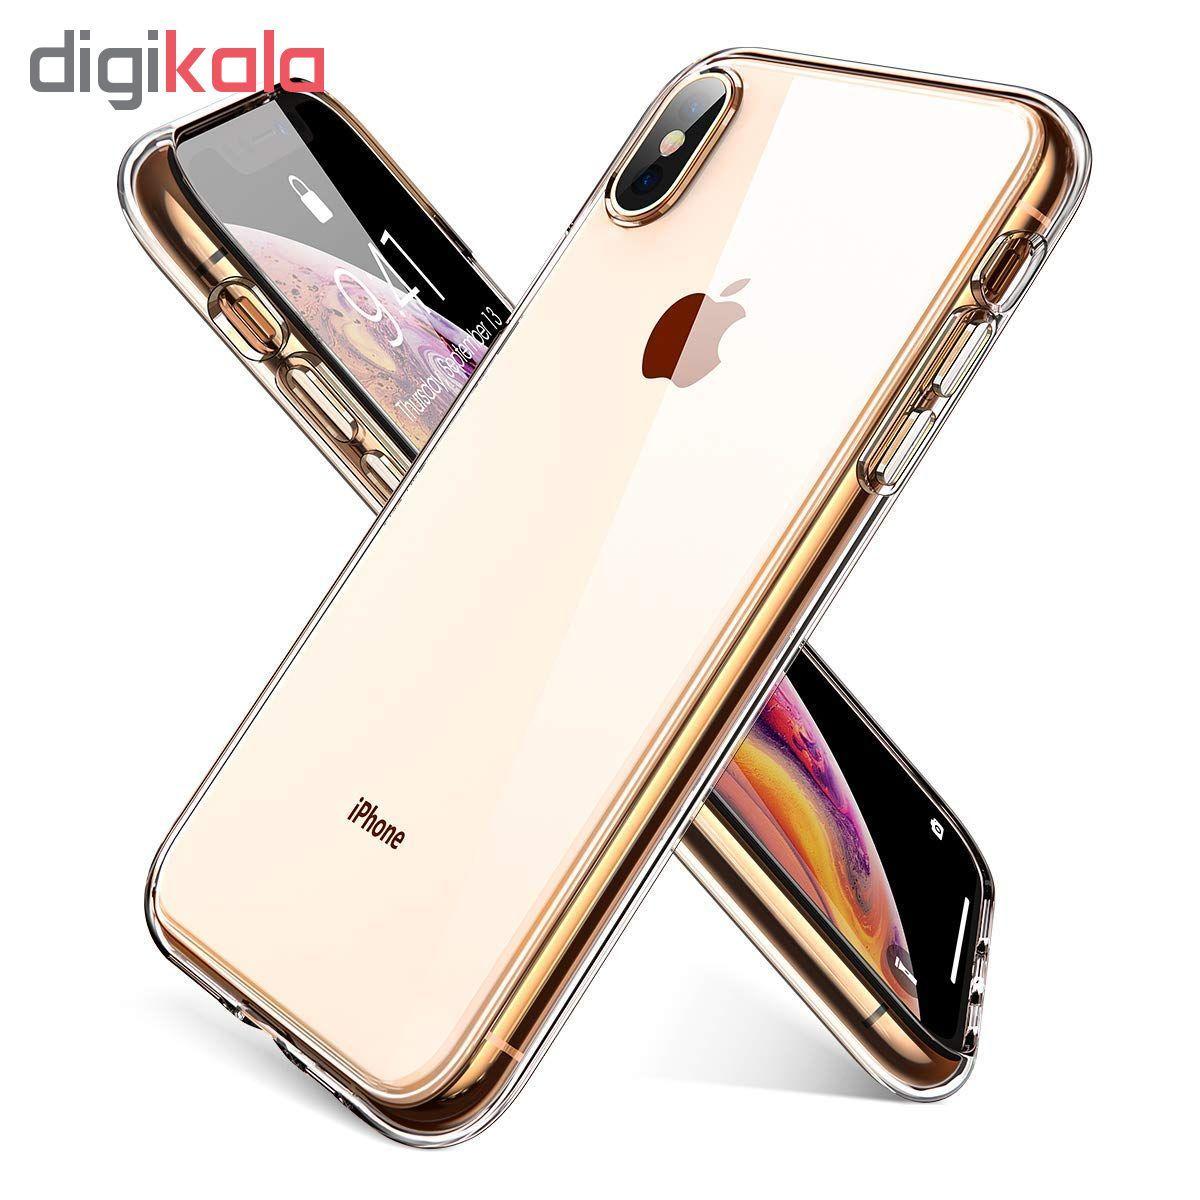 کاور آی دوژی مدل Electroplate Pc مناسب برای گوشی موبایل اپل iPhone XS Max main 1 1